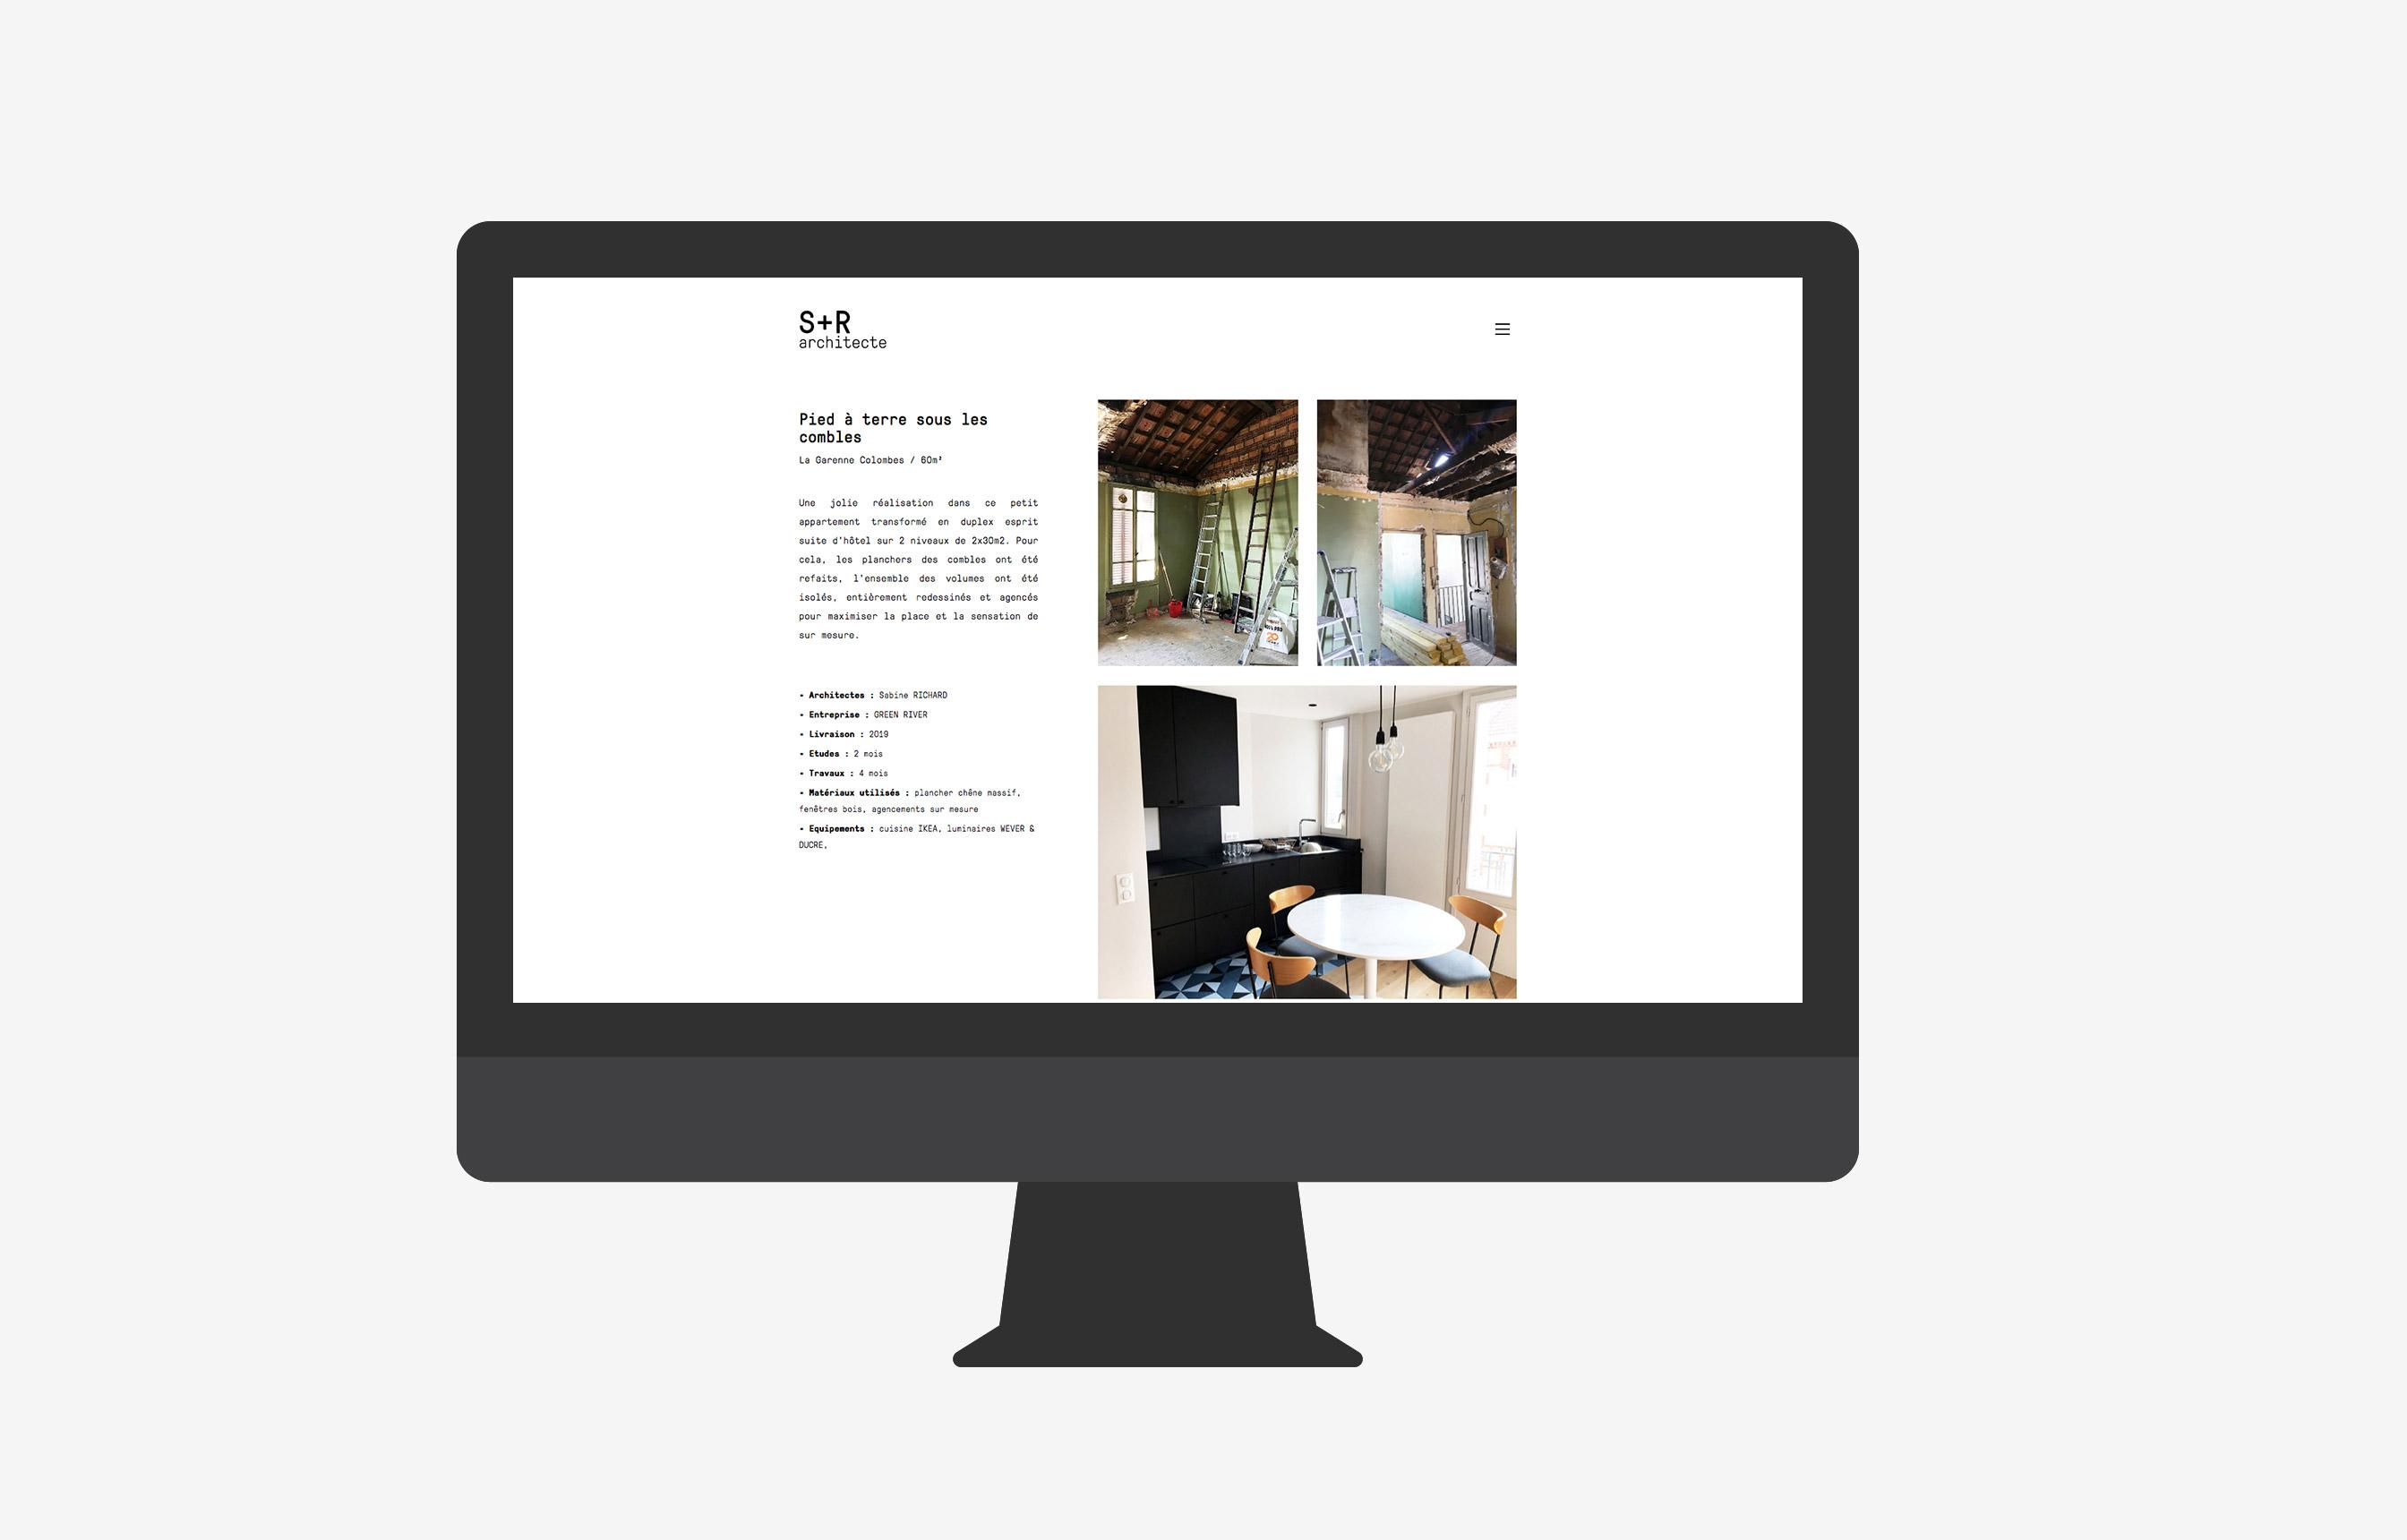 03-sr-architecte-pikteo-webdesign-graphic-design-freelance-paris-bruxelles-londres